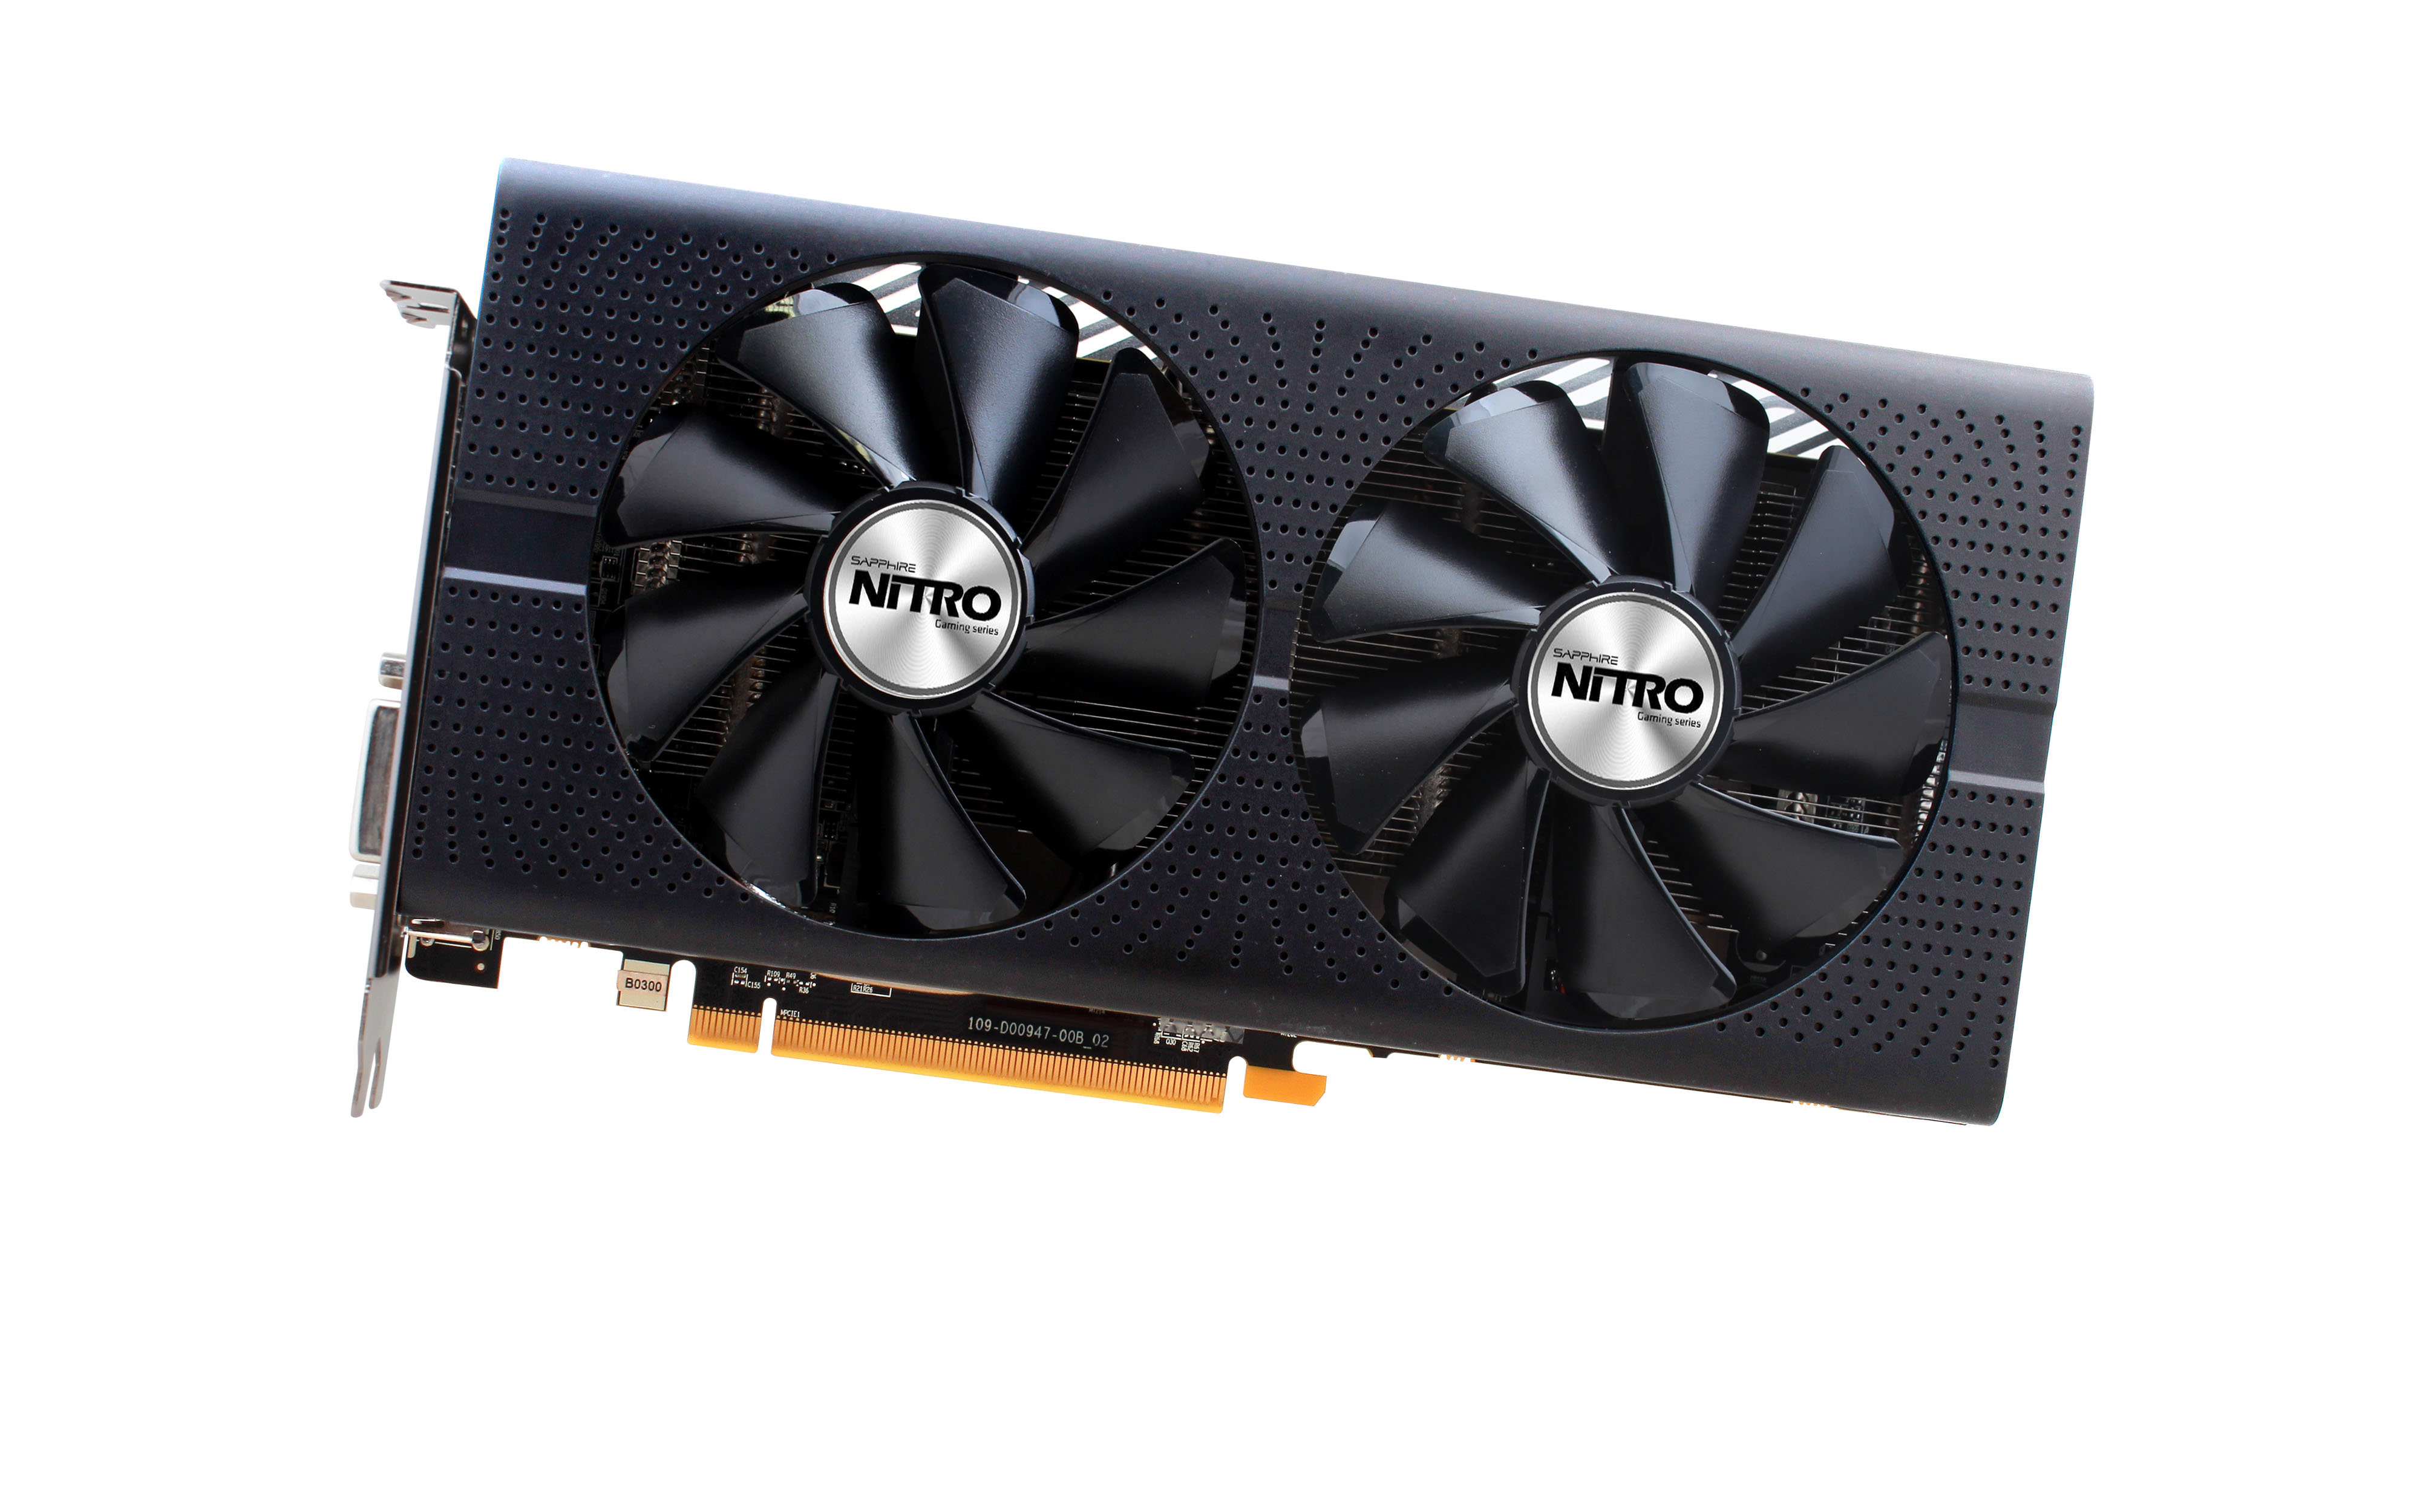 USED,Sapphire RX 570  Nitro 4G Graphics Cards 7000MHz GDDR5 256bits HDMI+DVI+DP*3 PCI-X16